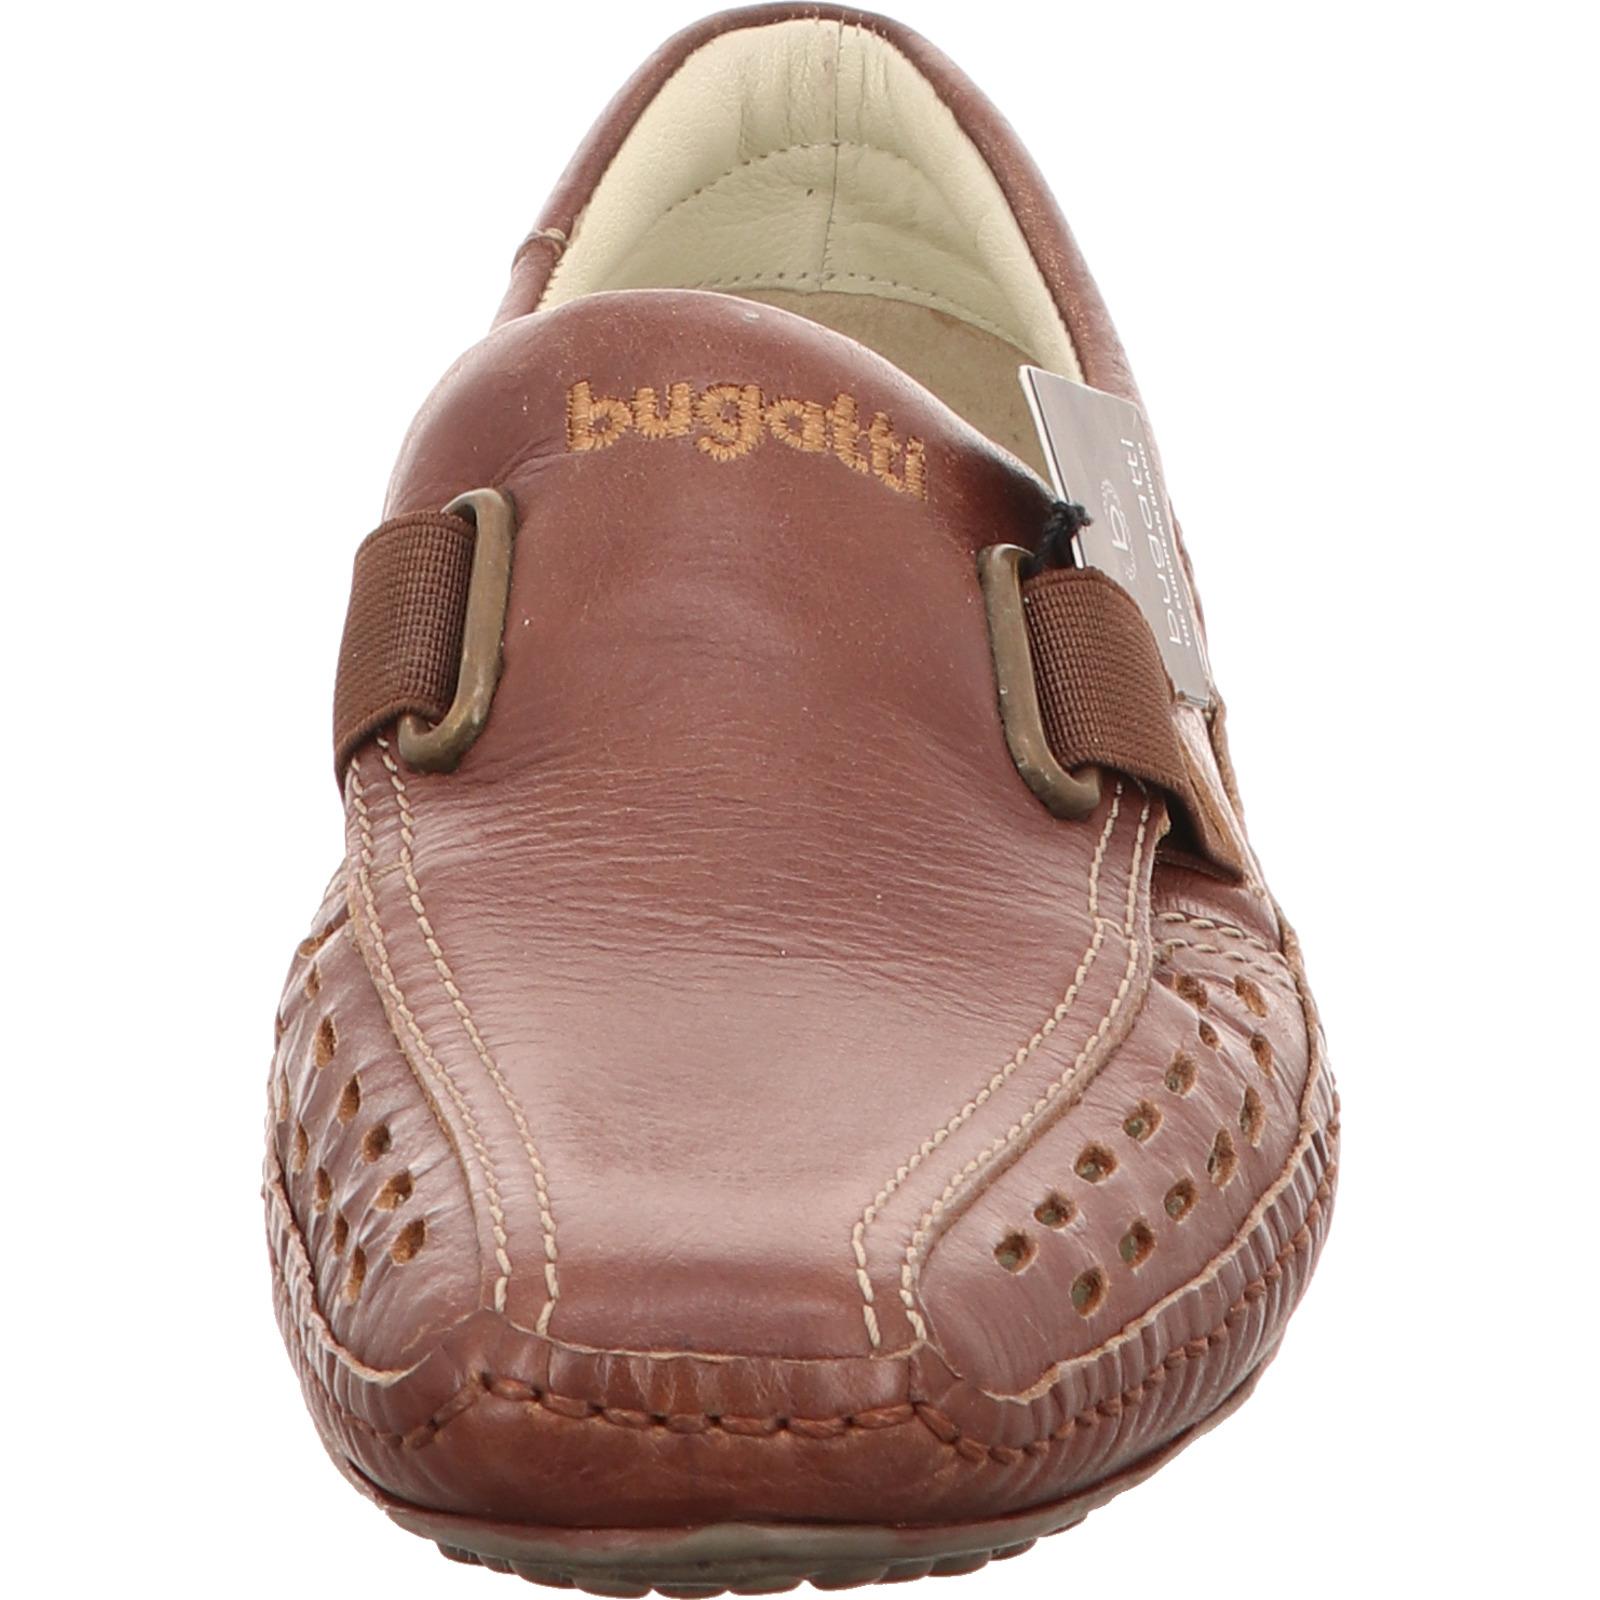 bugatti herren leder slipper schuhe sneaker freizeit braun ebay. Black Bedroom Furniture Sets. Home Design Ideas